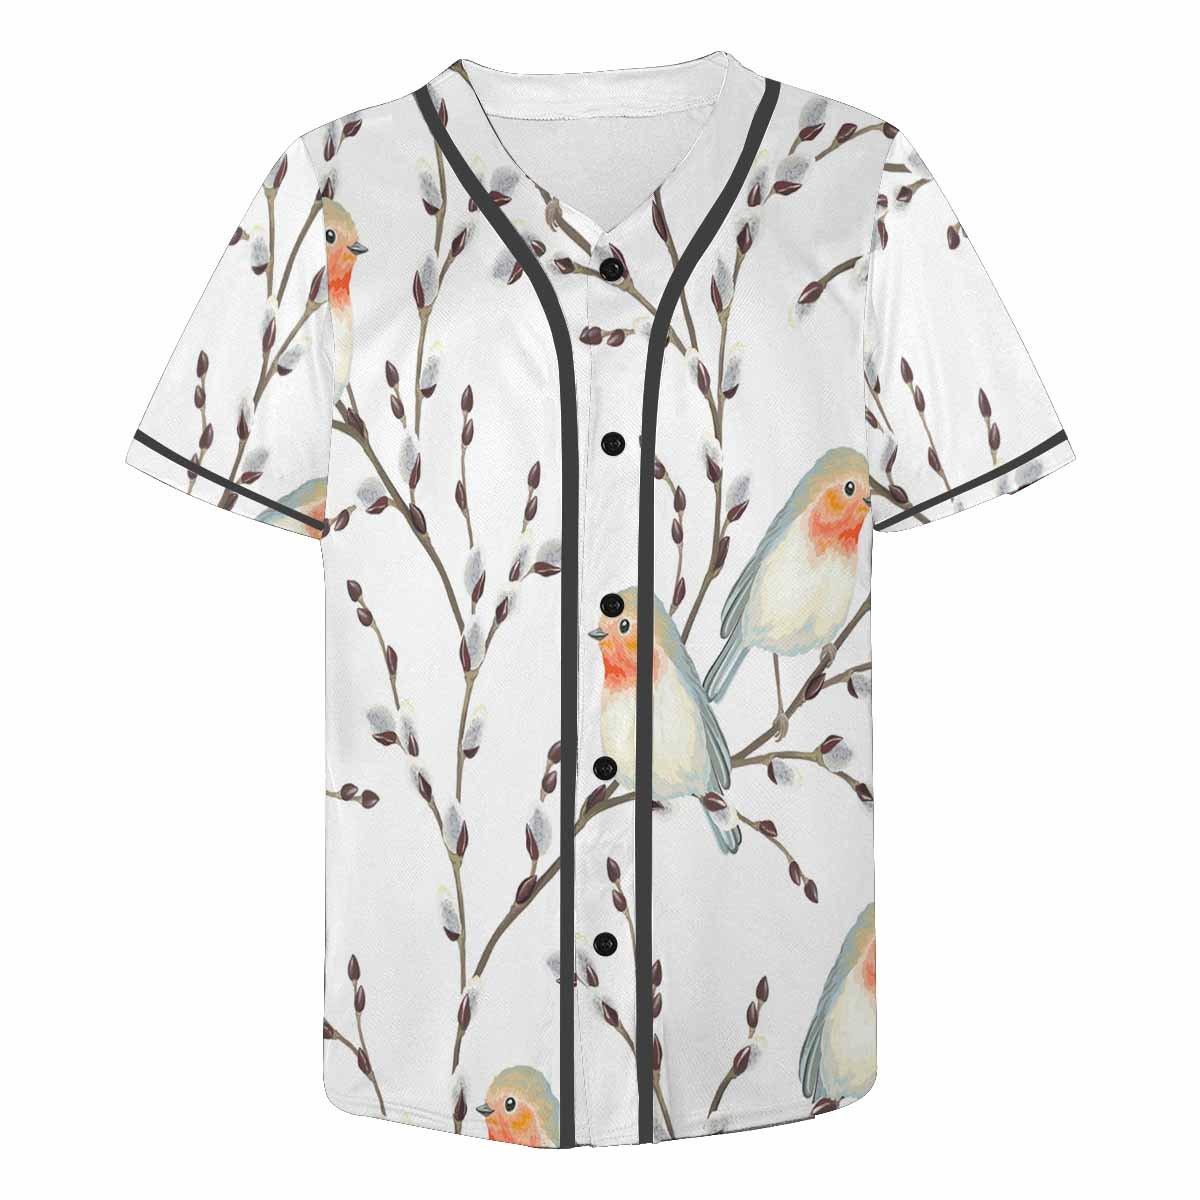 INTERESTPRINT Mens Button Down Baseball Jersey Willow Branches and Birds Robin